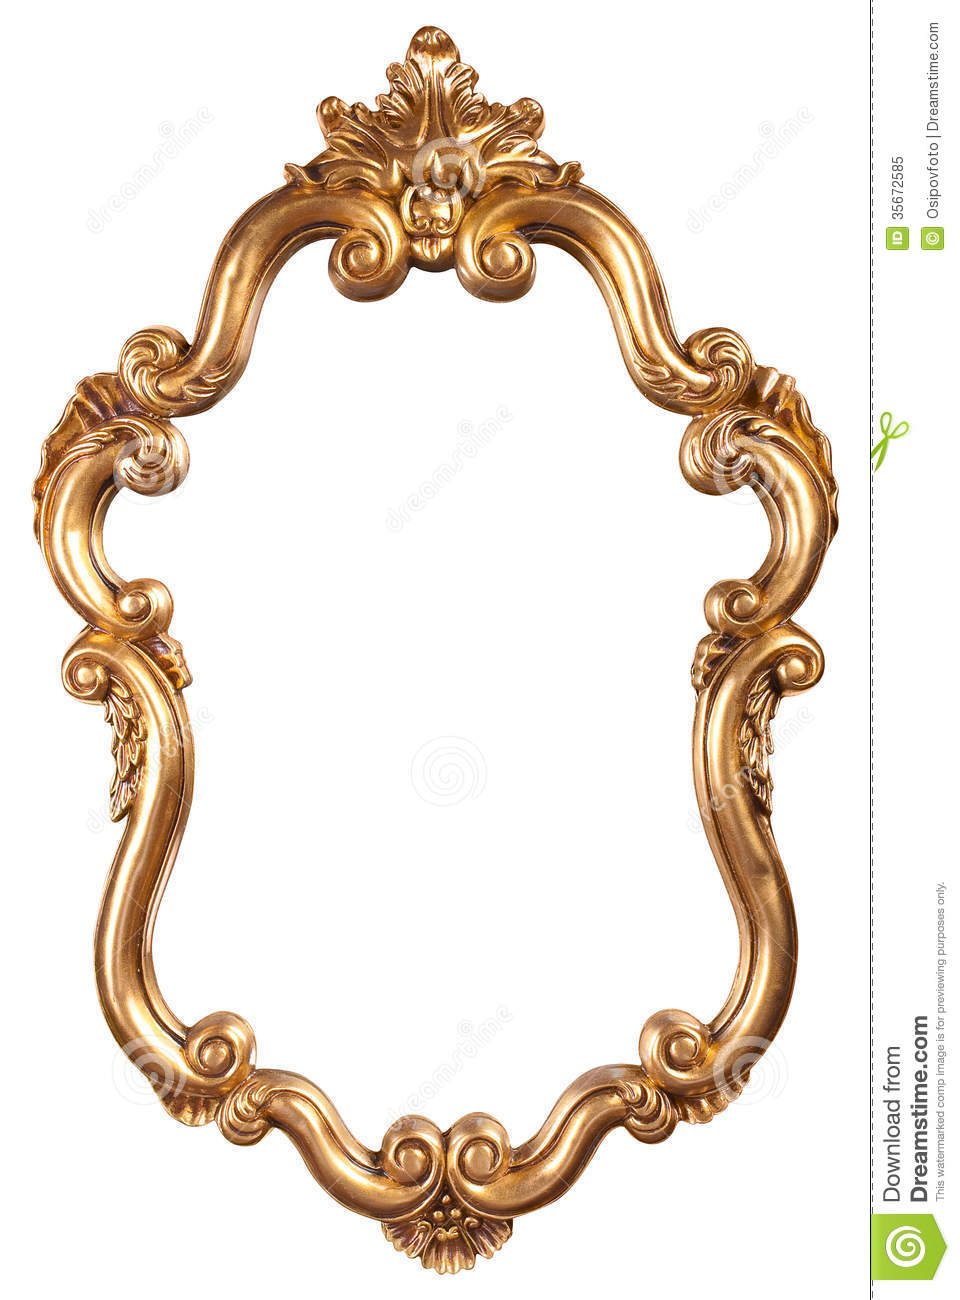 Antique gold frame clipart image Antique Gold Frames Clipart Round Frame Clip Art Design And Decor ... image